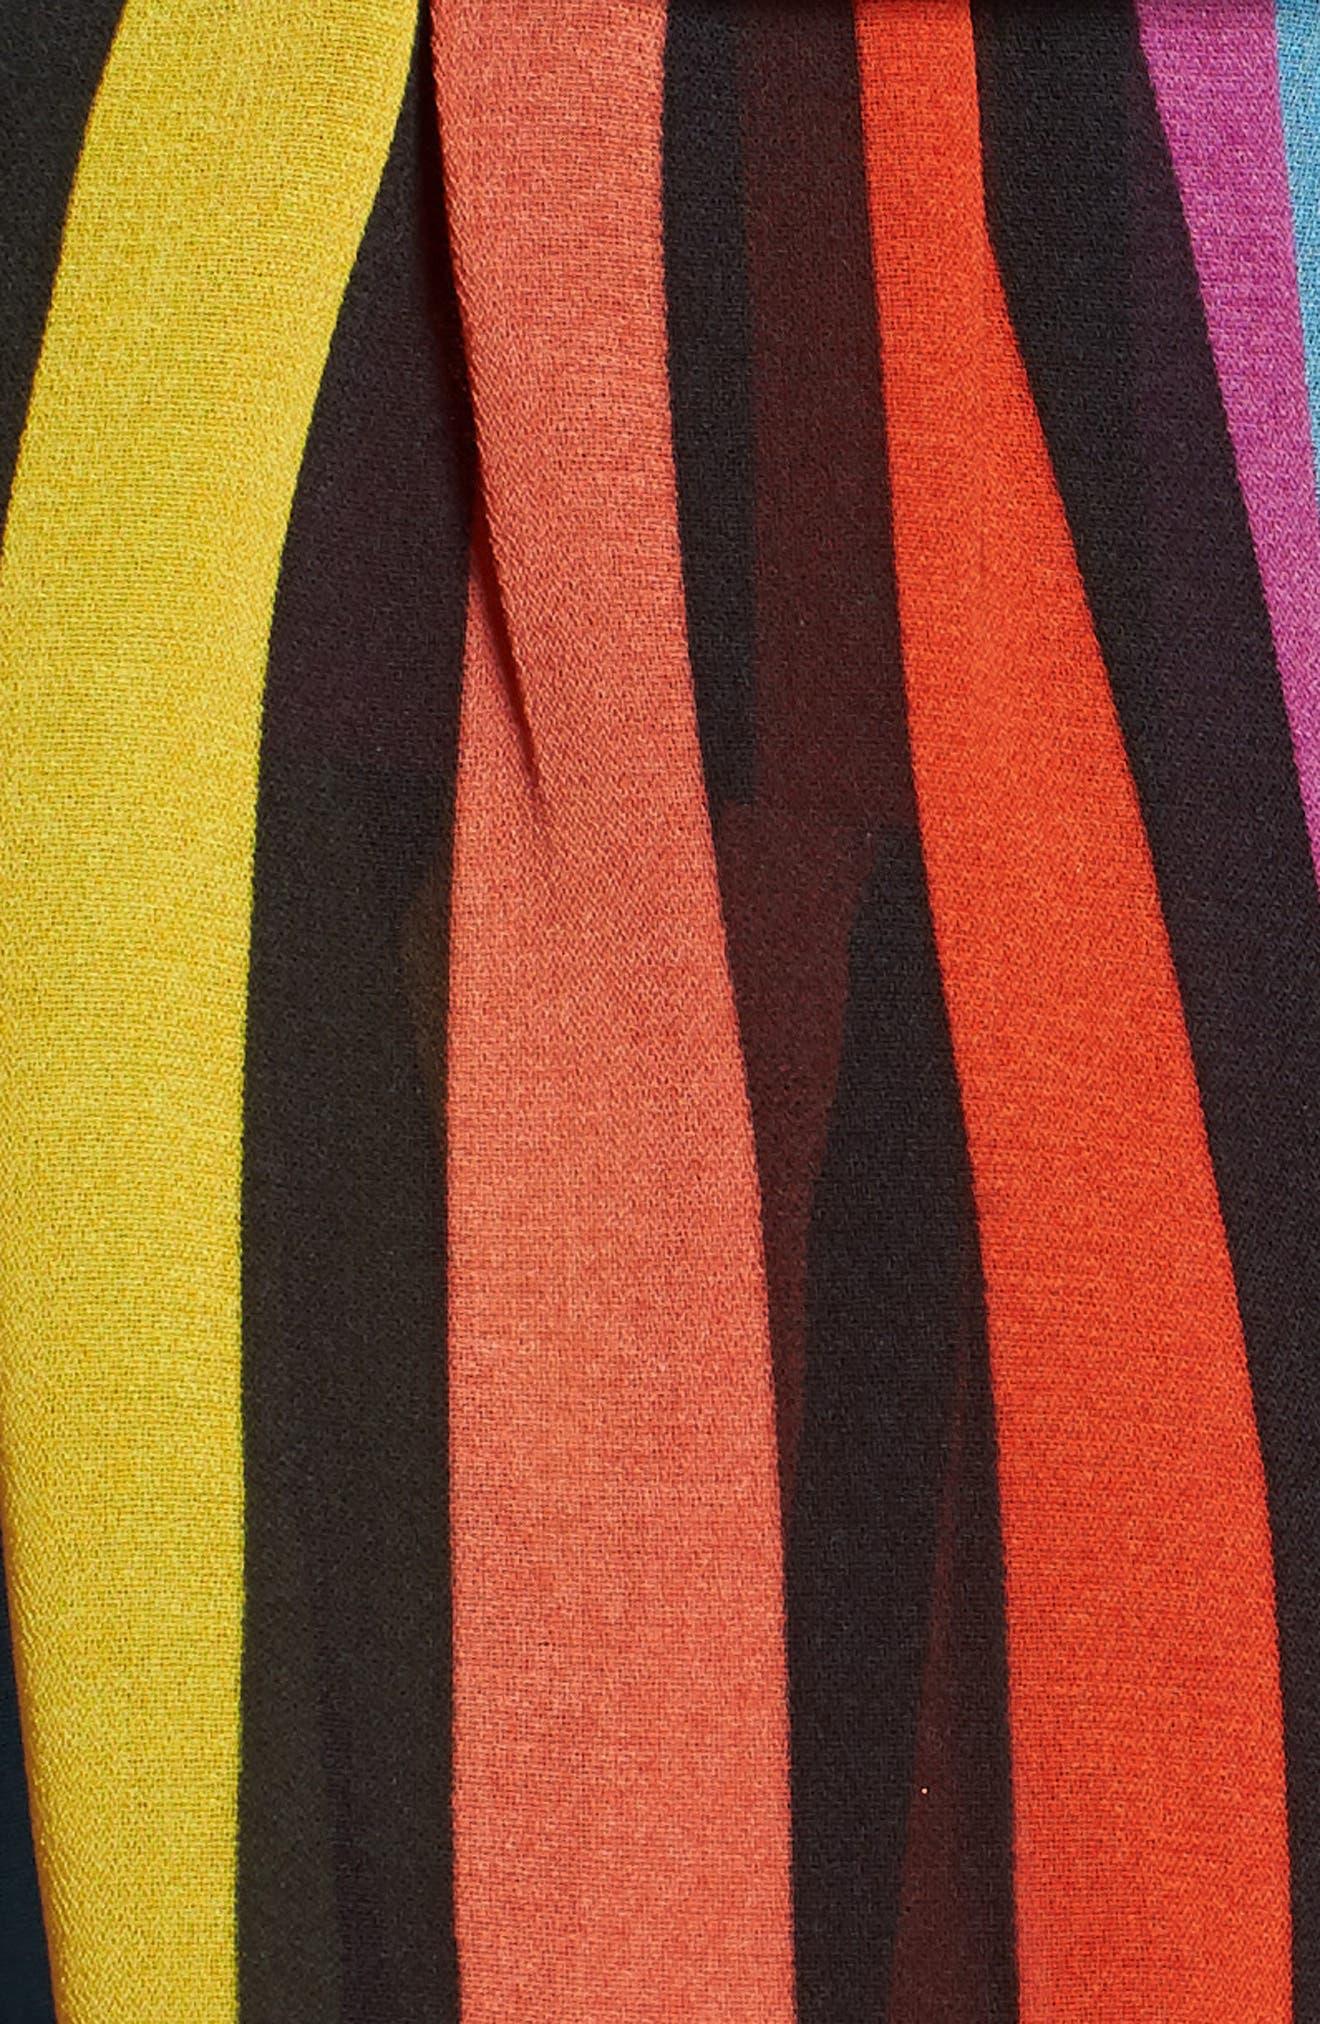 Toulon Tiered Ruffle Top,                             Alternate thumbnail 6, color,                             Rainbow Stripe